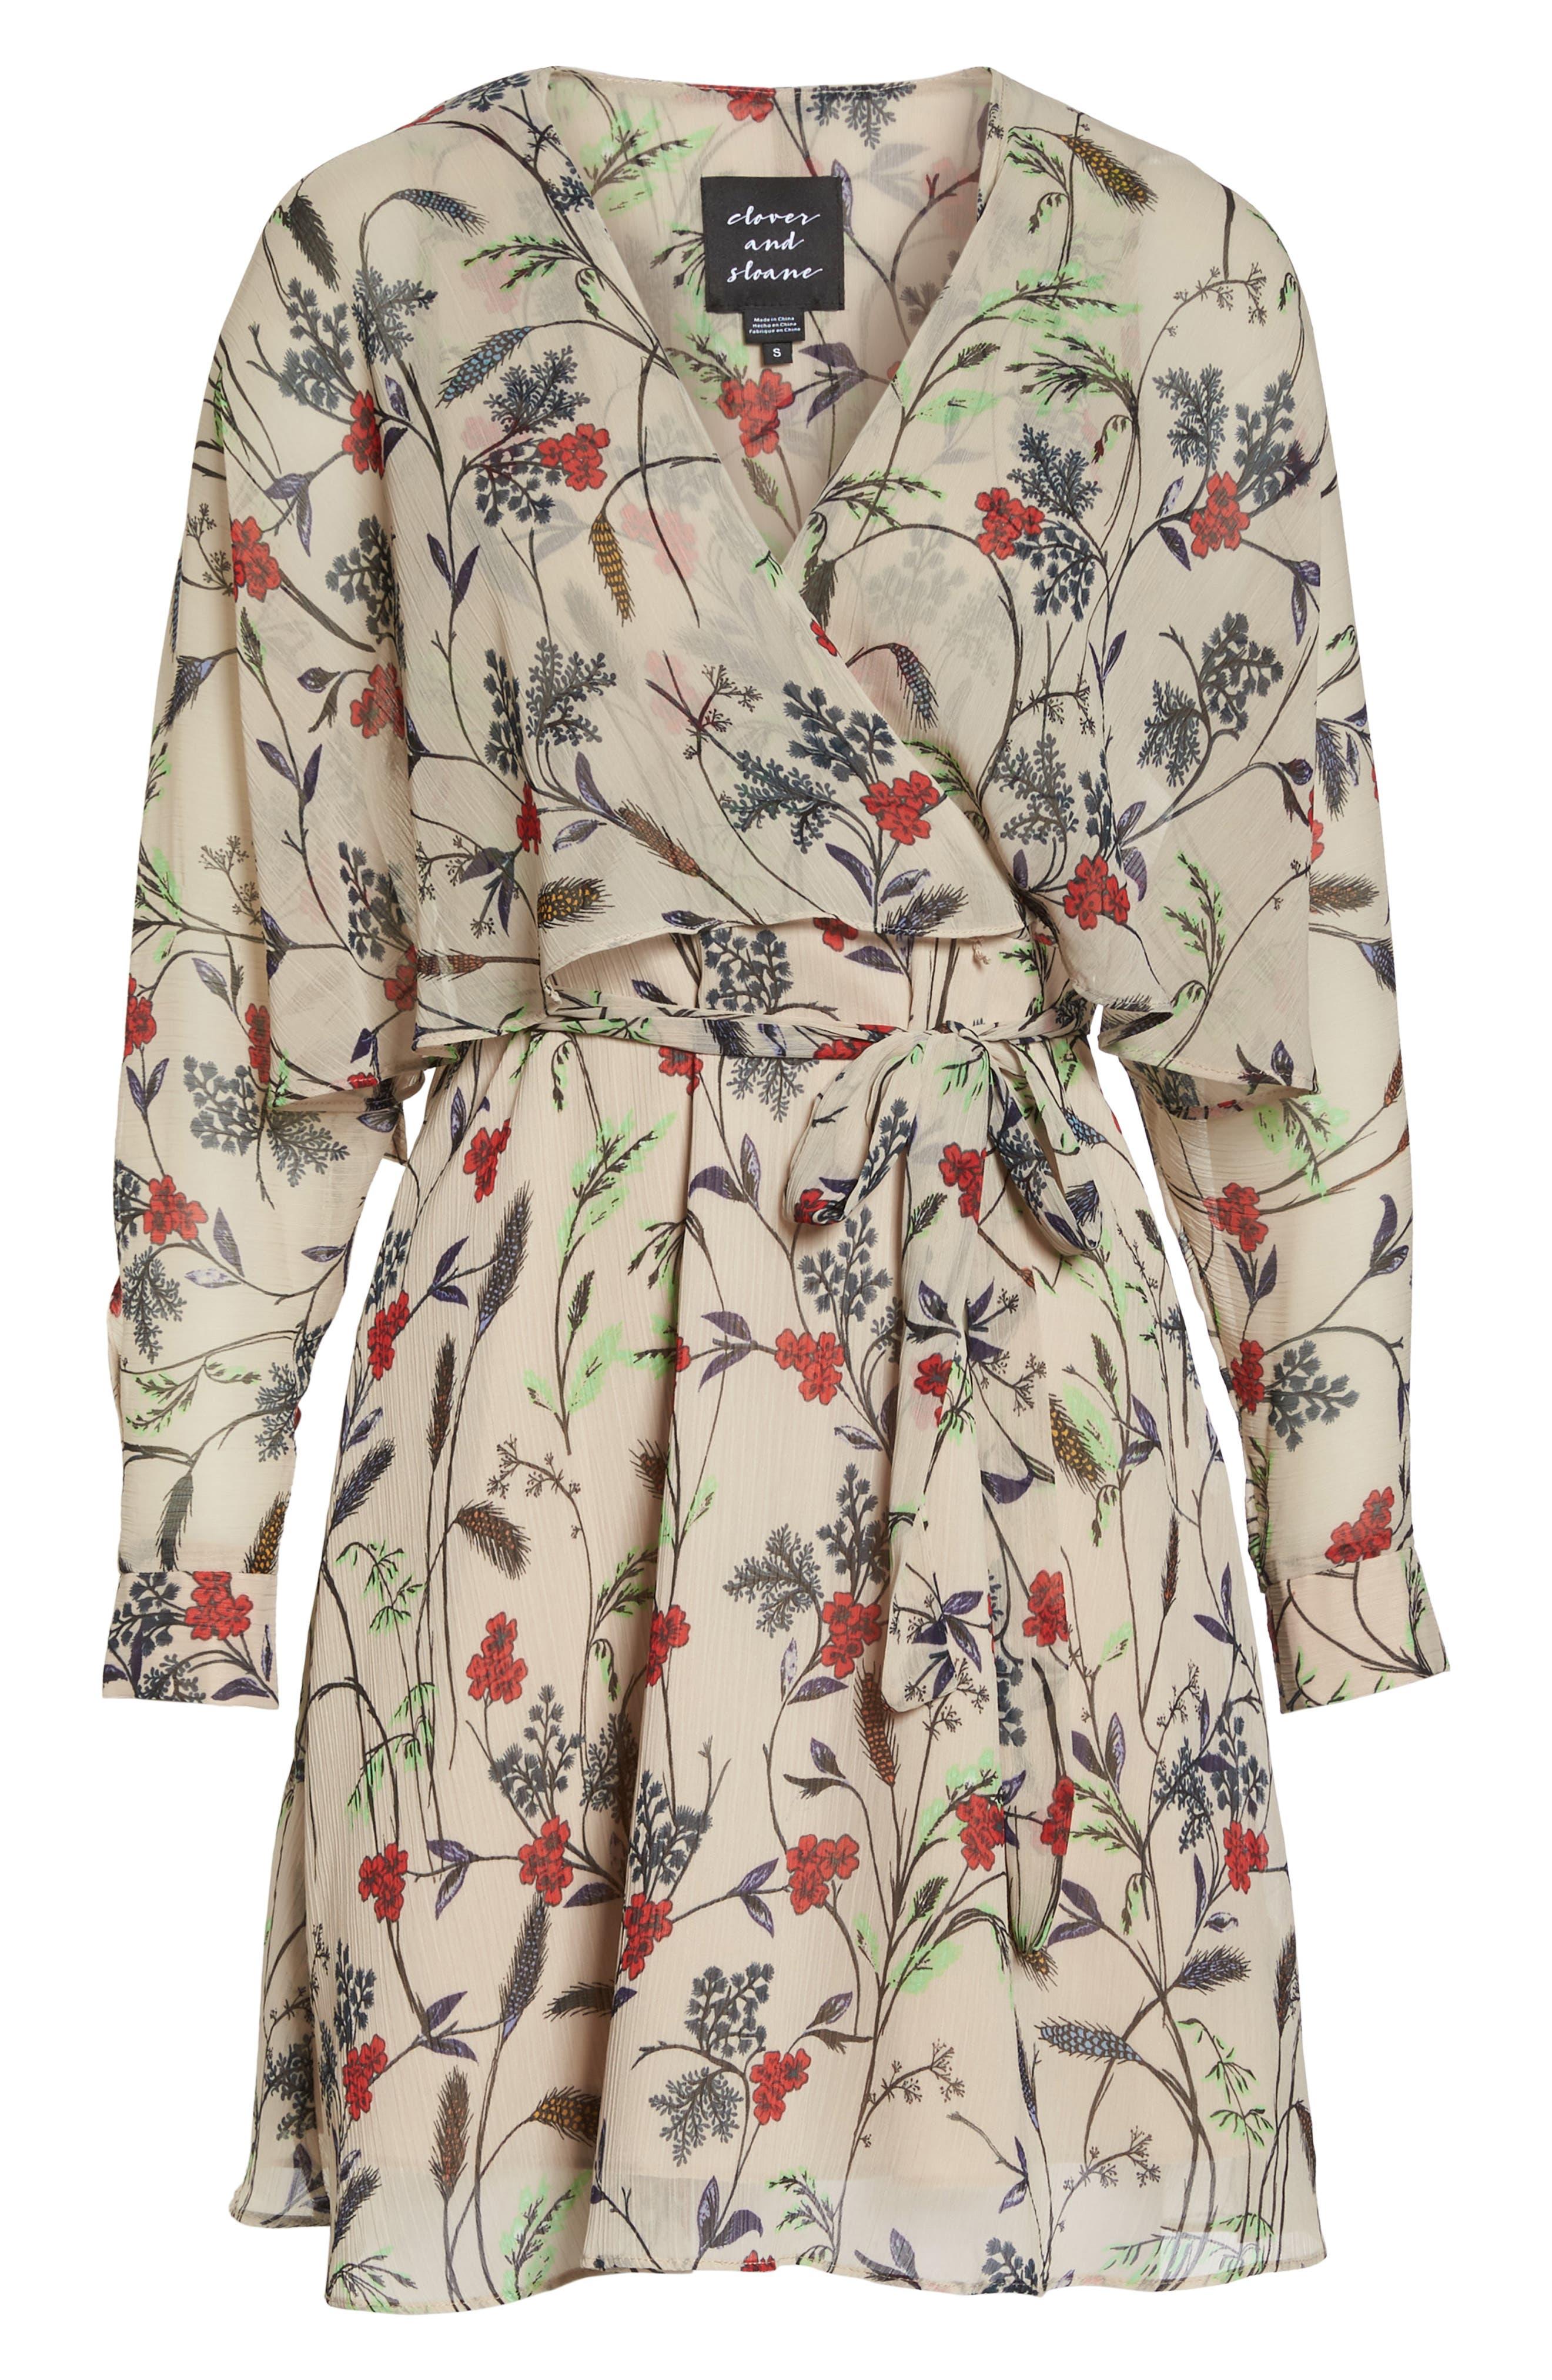 Yoryu Floral Chiffon Dress,                             Alternate thumbnail 7, color,                             280